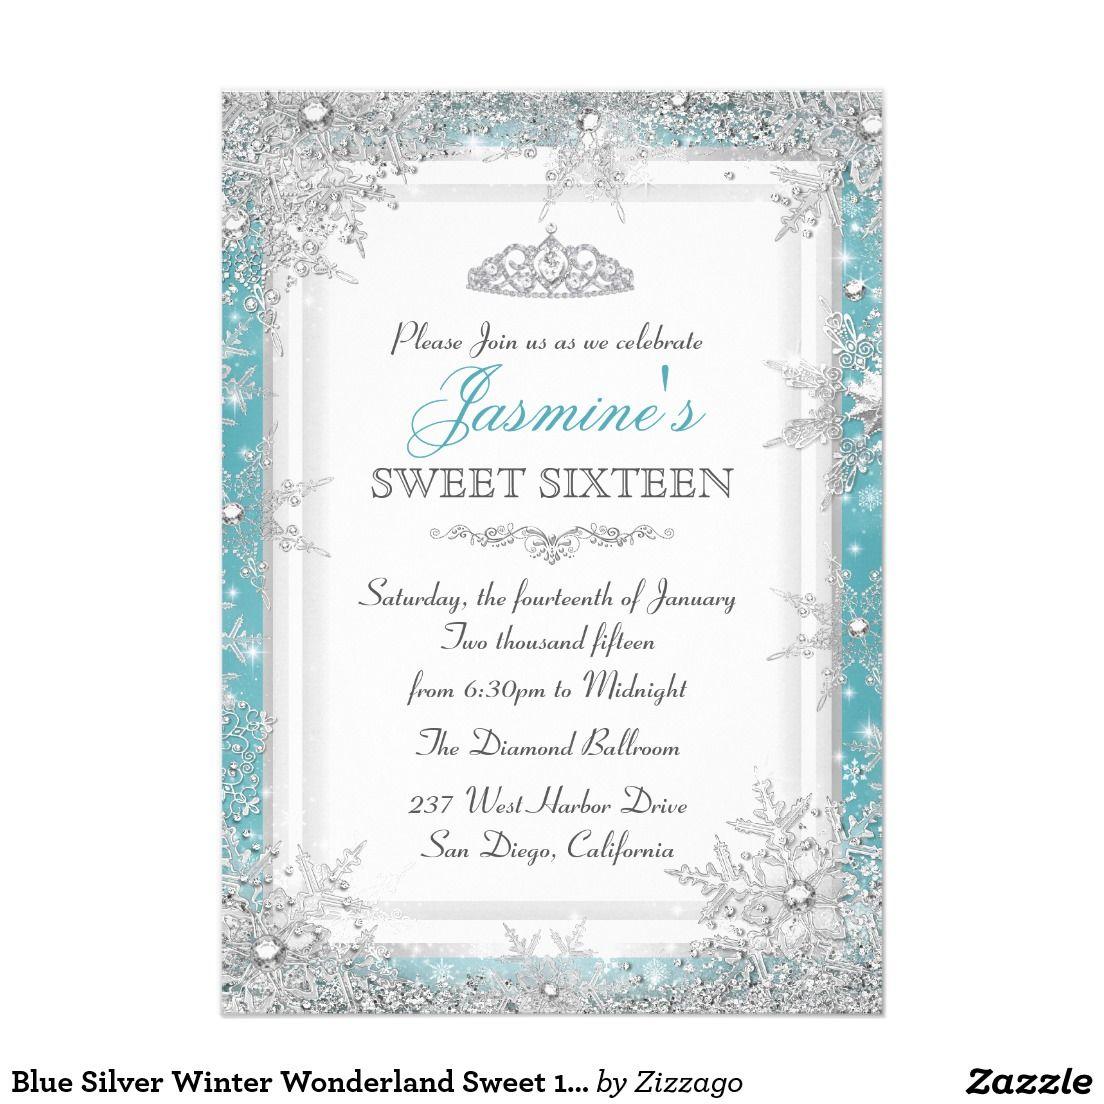 Blue Silver Winter Wonderland Sweet 16 Invitation | decor ...